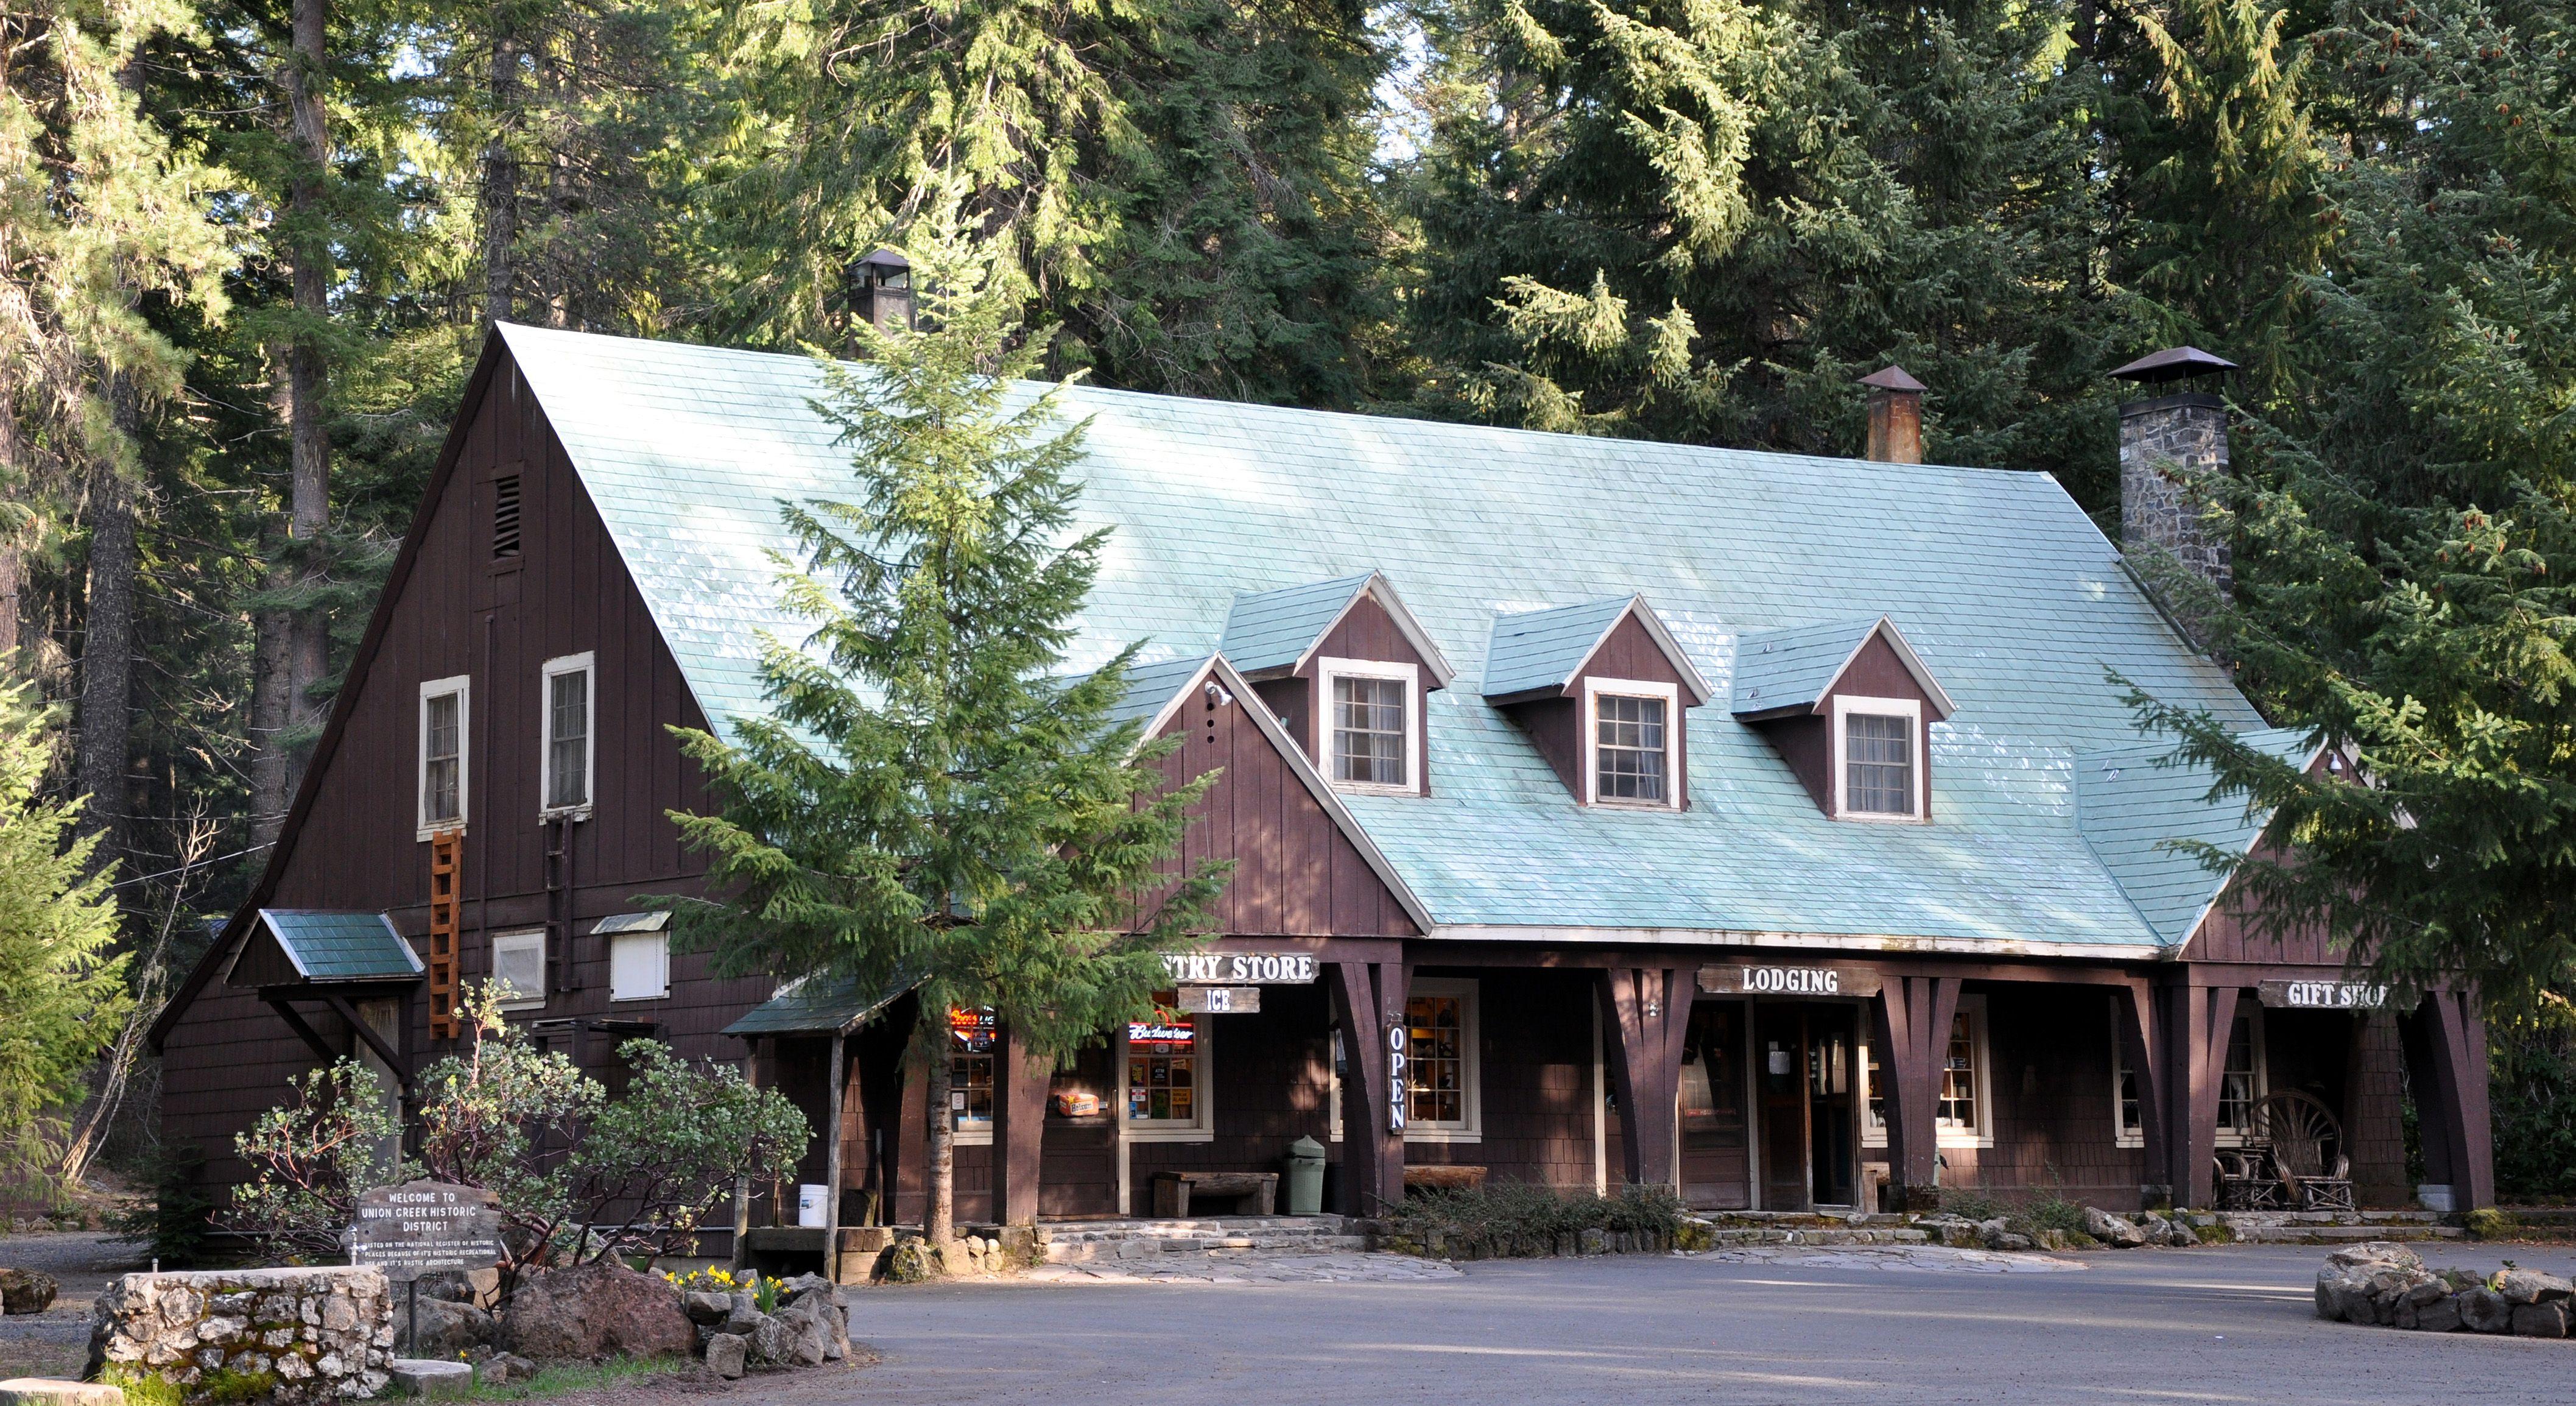 union creek lodge. union creek, oregon. i love old lodges and